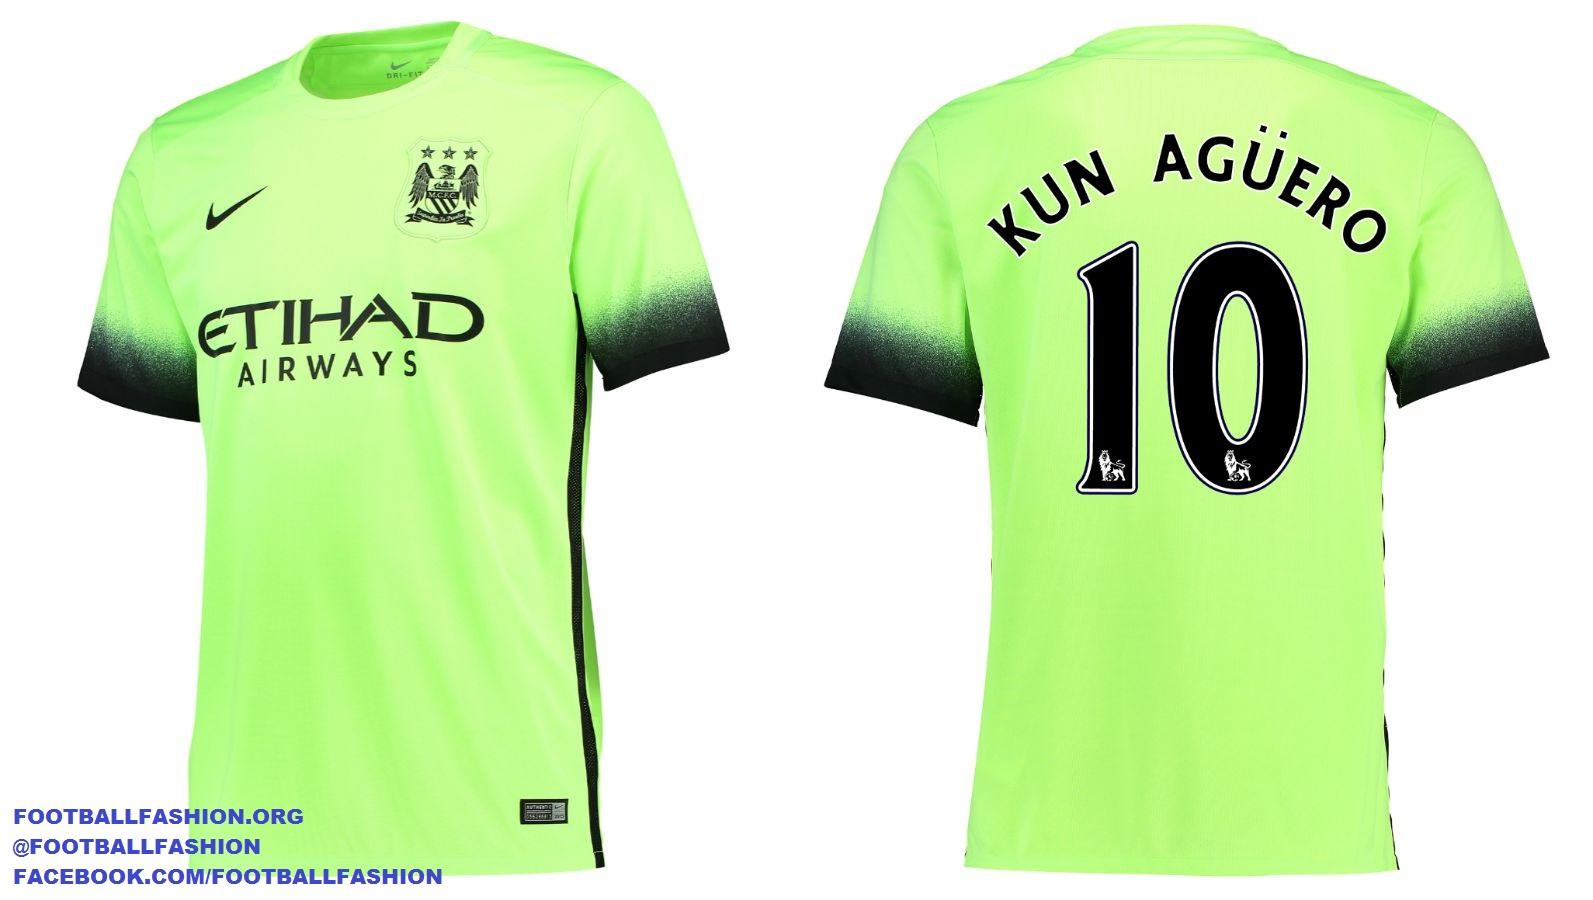 new style 31aa0 7230b Manchester City 2015/16 Nike Third Kit - FOOTBALL FASHION.ORG